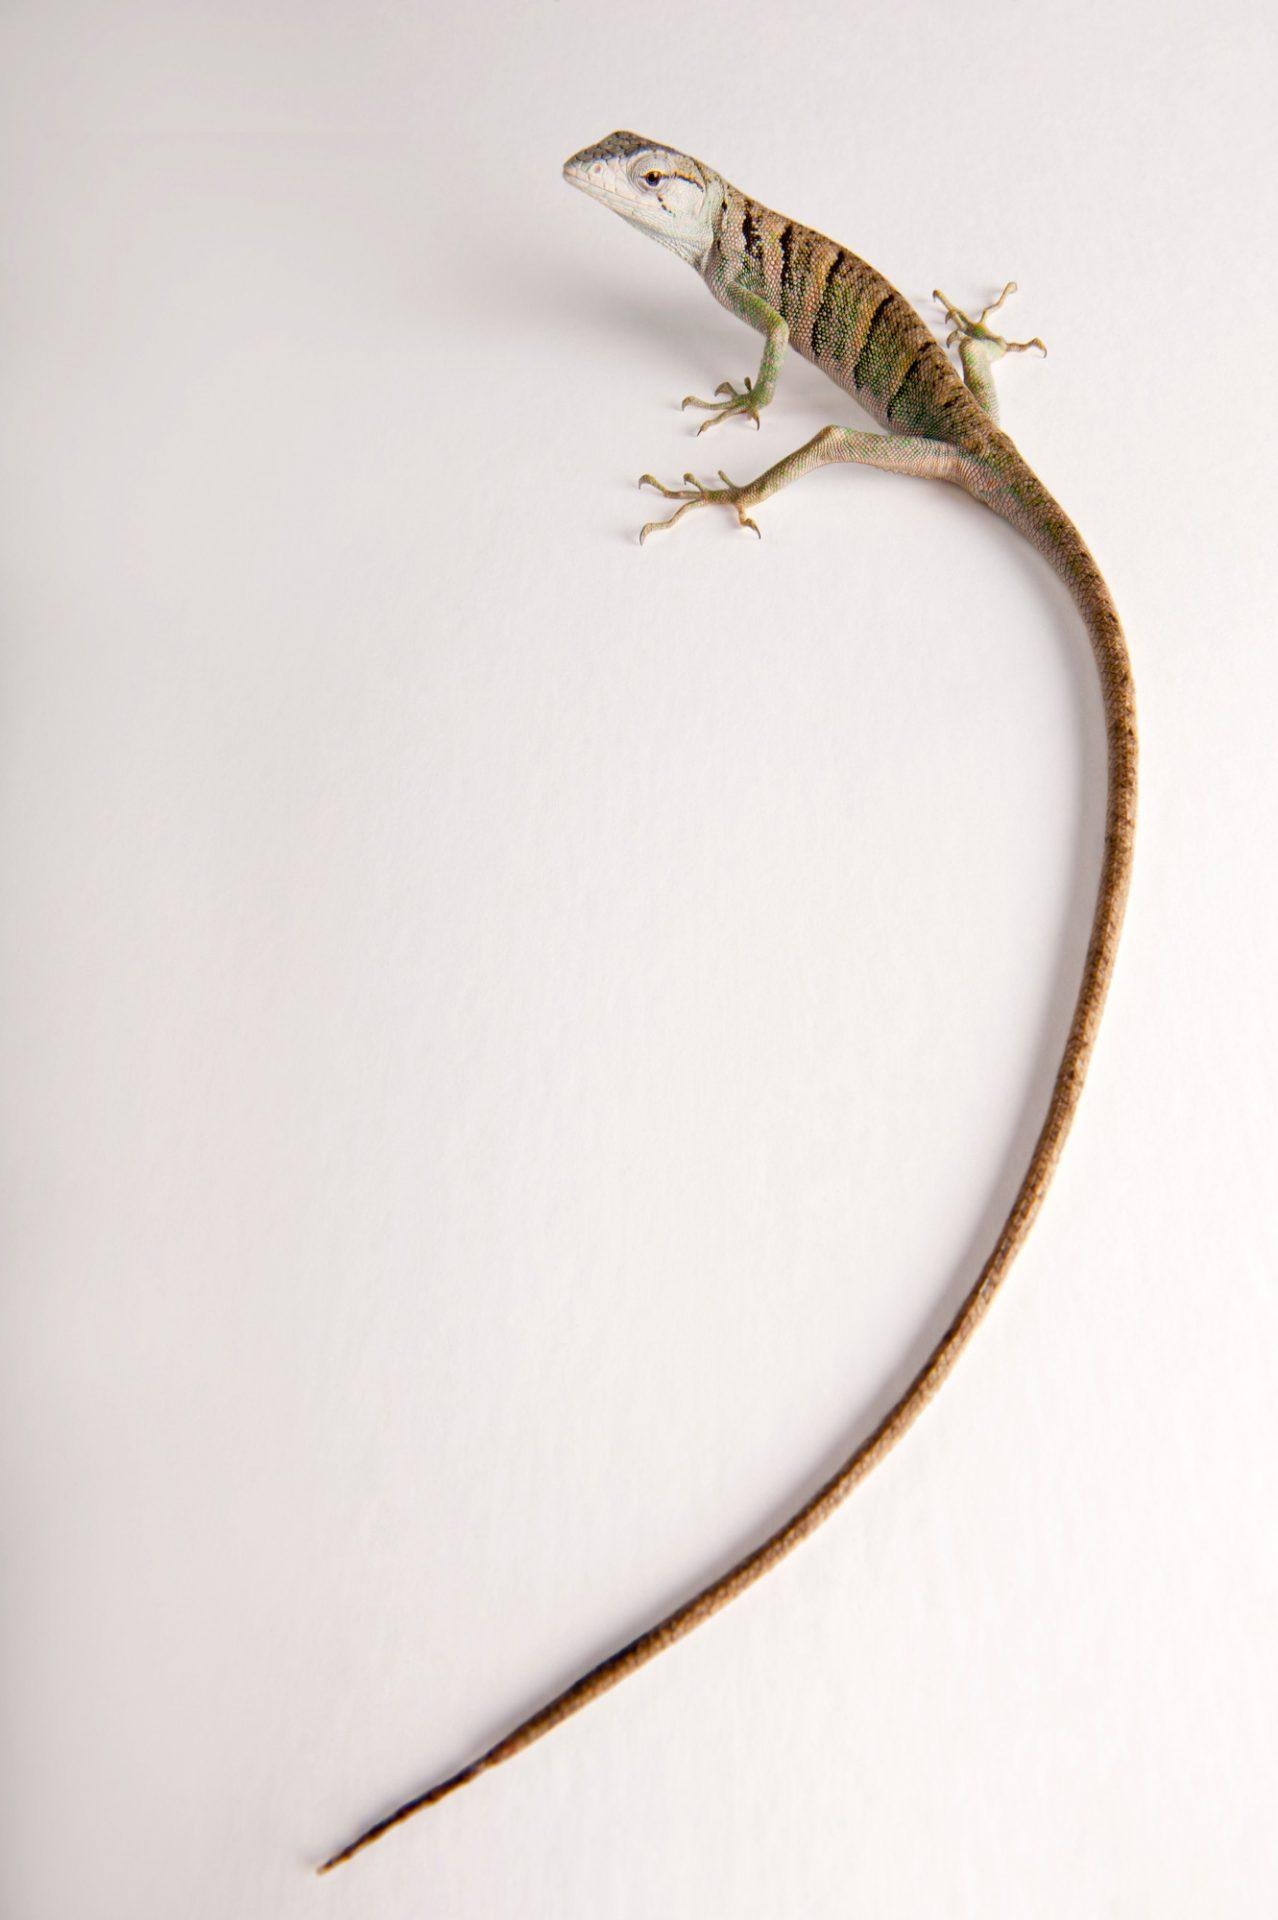 Photo: A common Monkey Lizard (Polychrus marmoratus) at the National Aquarium, Baltimore.